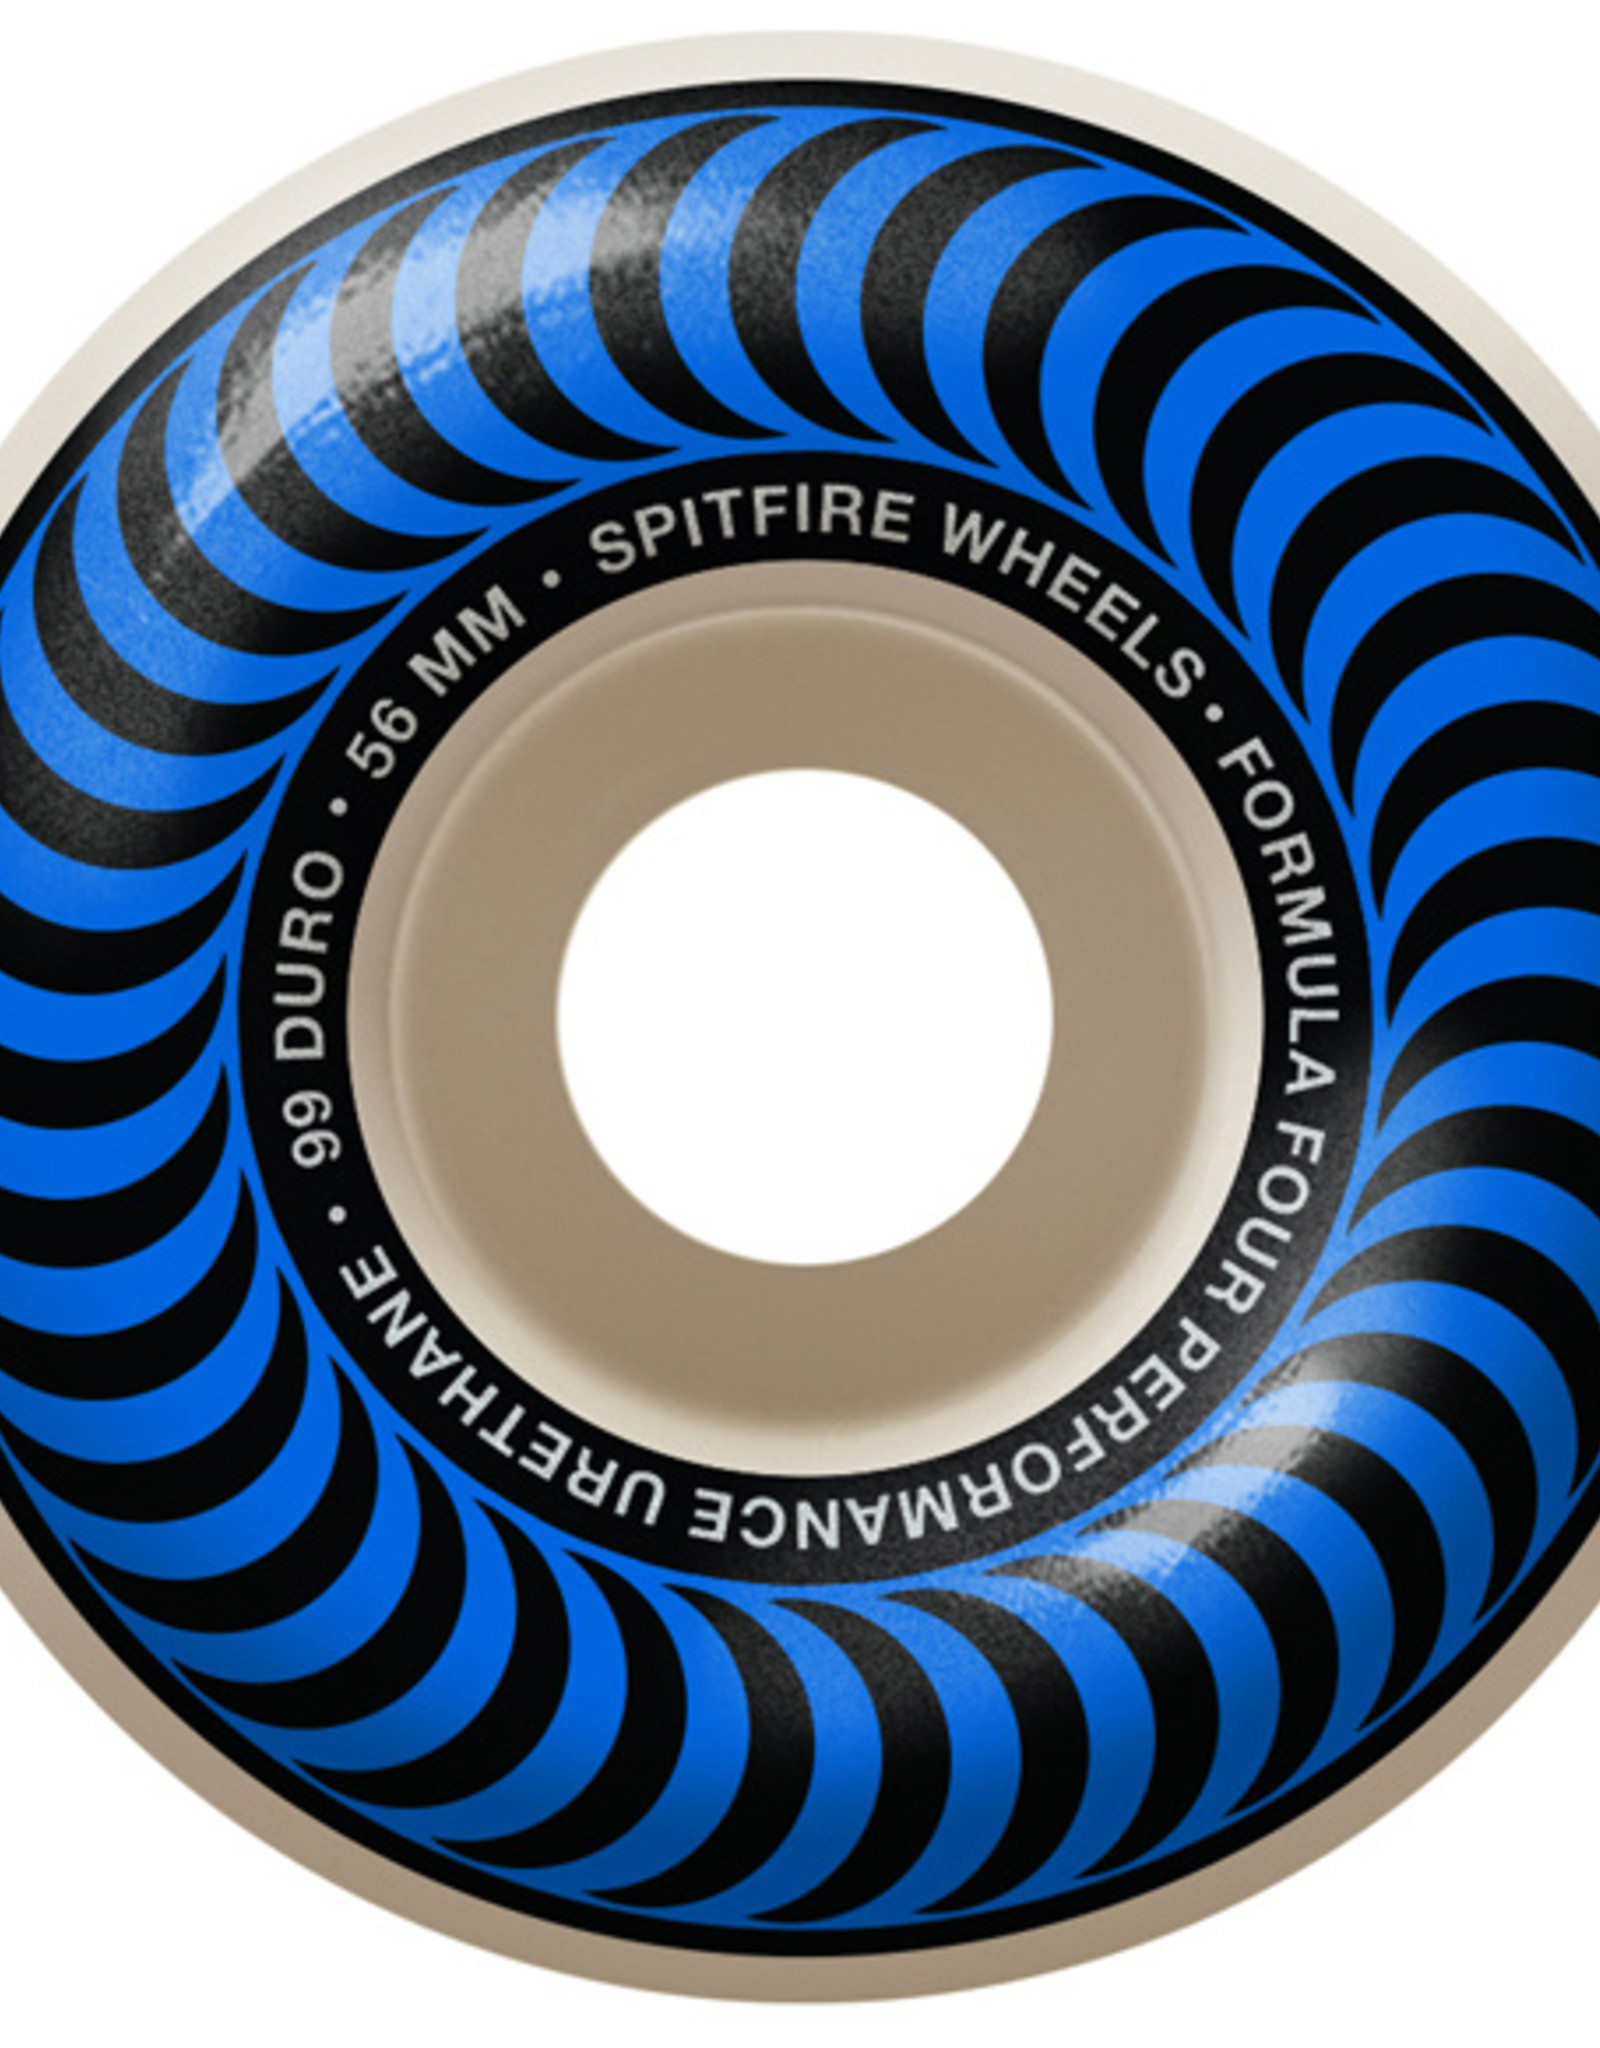 Spitfire SPITFIRE FORMULA FOUR CLASSIC 99D 56MM BLUE SWIRL